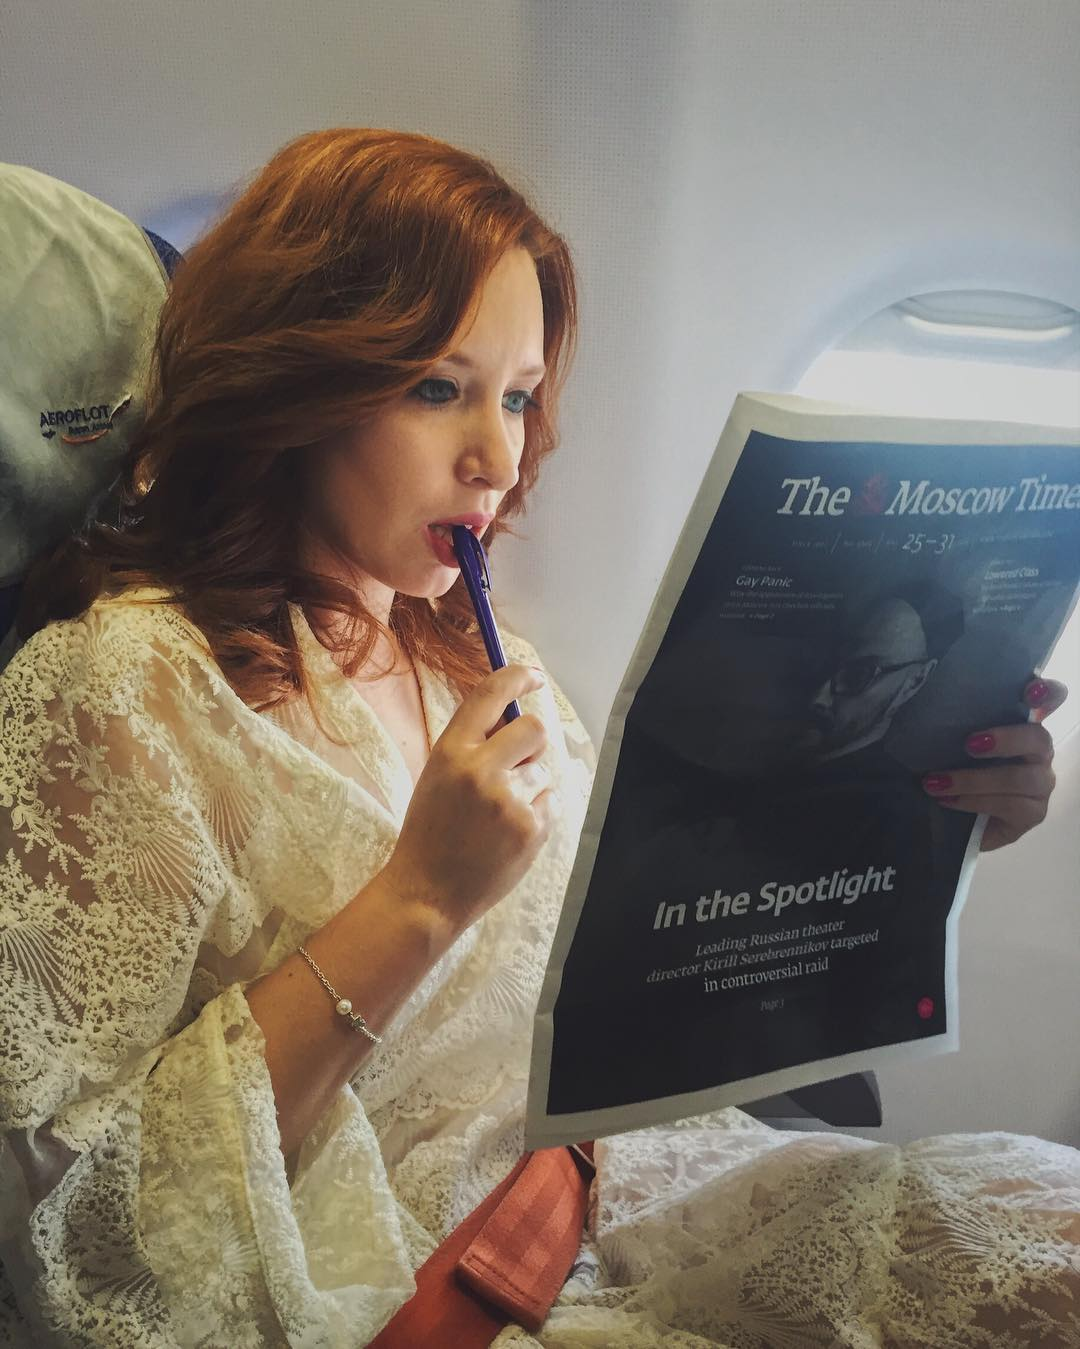 Ирина Шихман: биография, личная жизнь, муж, фото